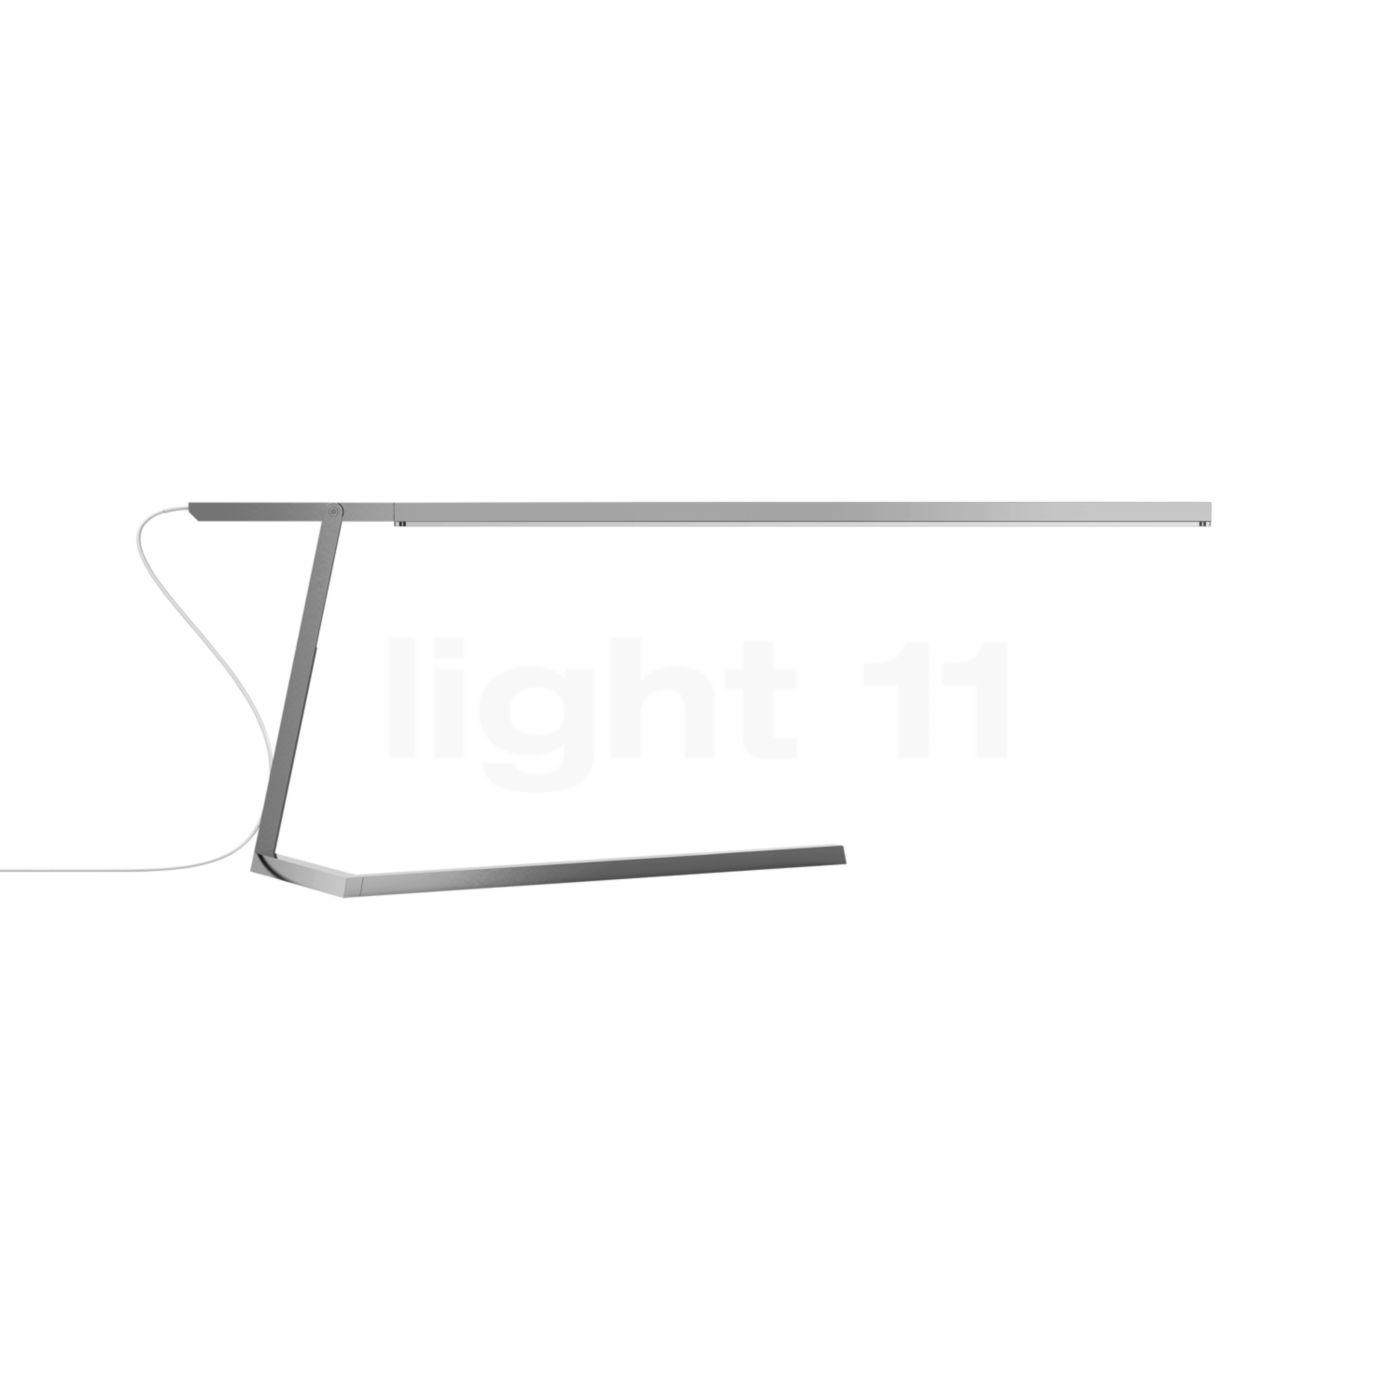 Steng Licht steng licht oneline table l led workplace ls